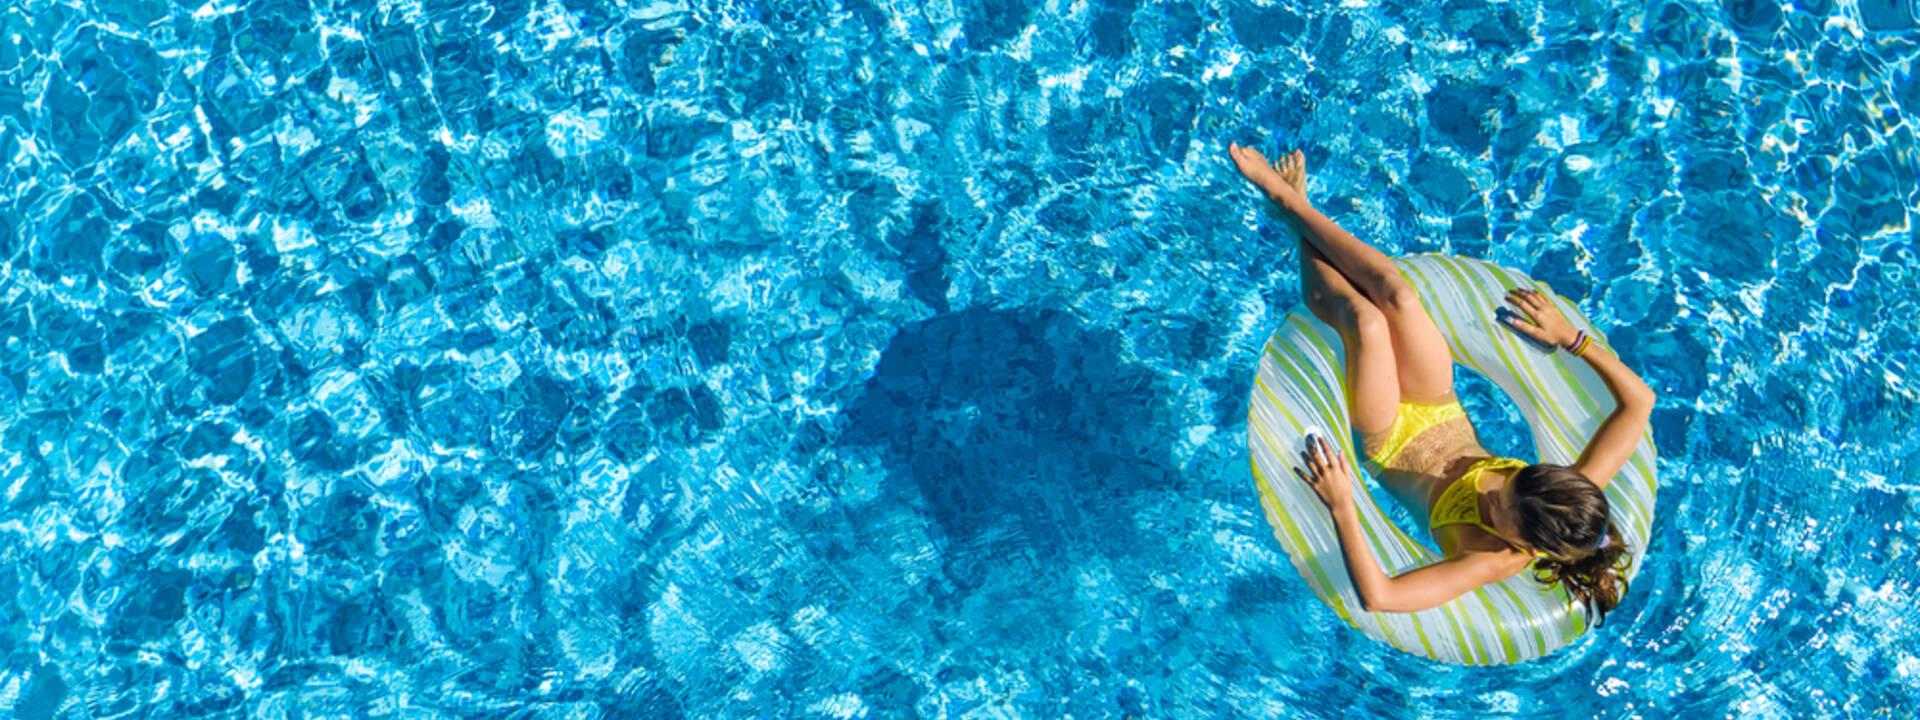 Photo piscine au camping - ©Shutterstock